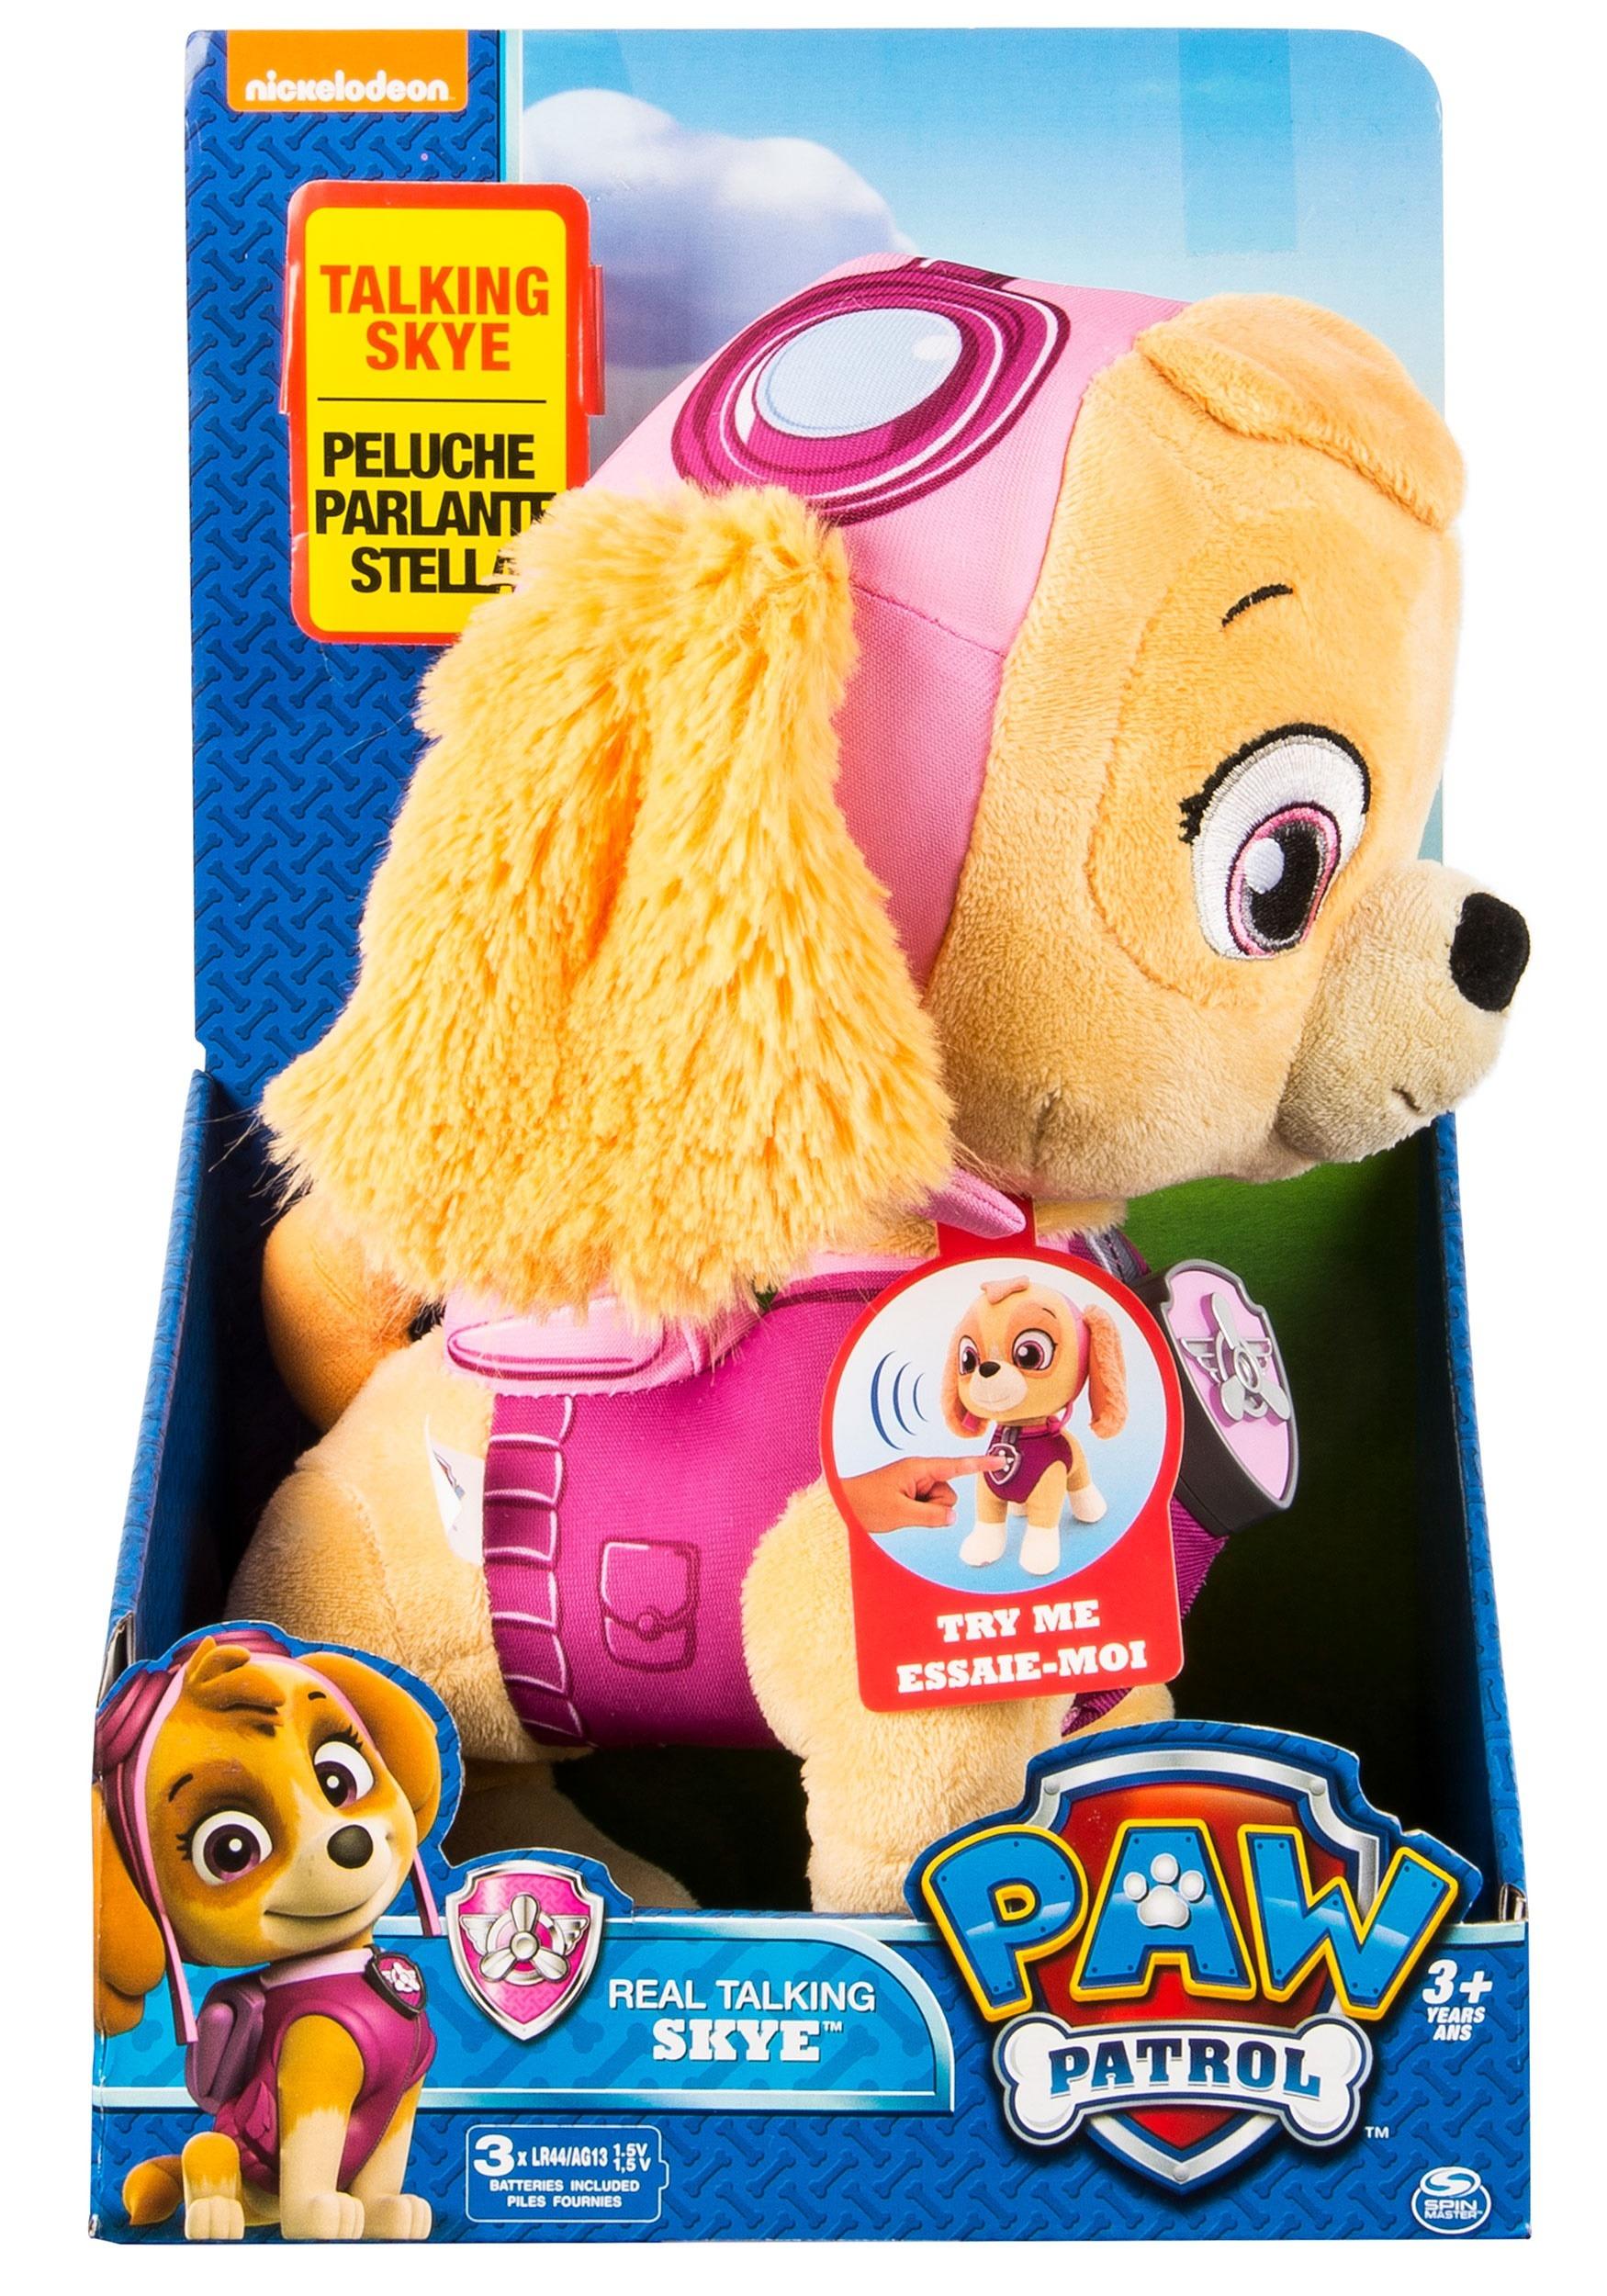 Paw Patrol Skye Talking Stuffed Toy 9c9ca7c1a7